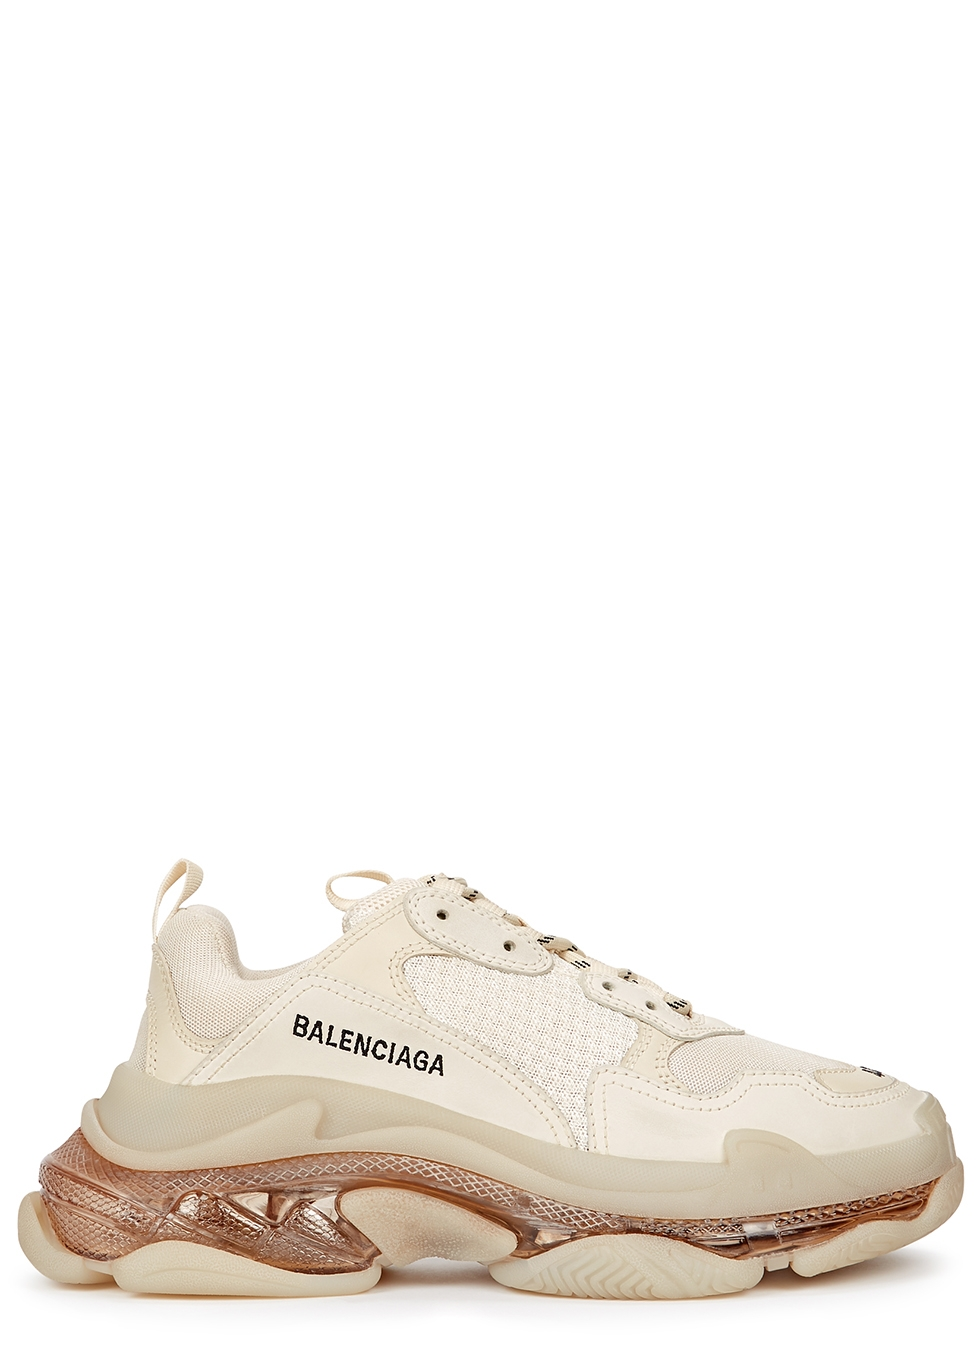 Balenciaga Triple S Taupe Multi Sneakers StockX